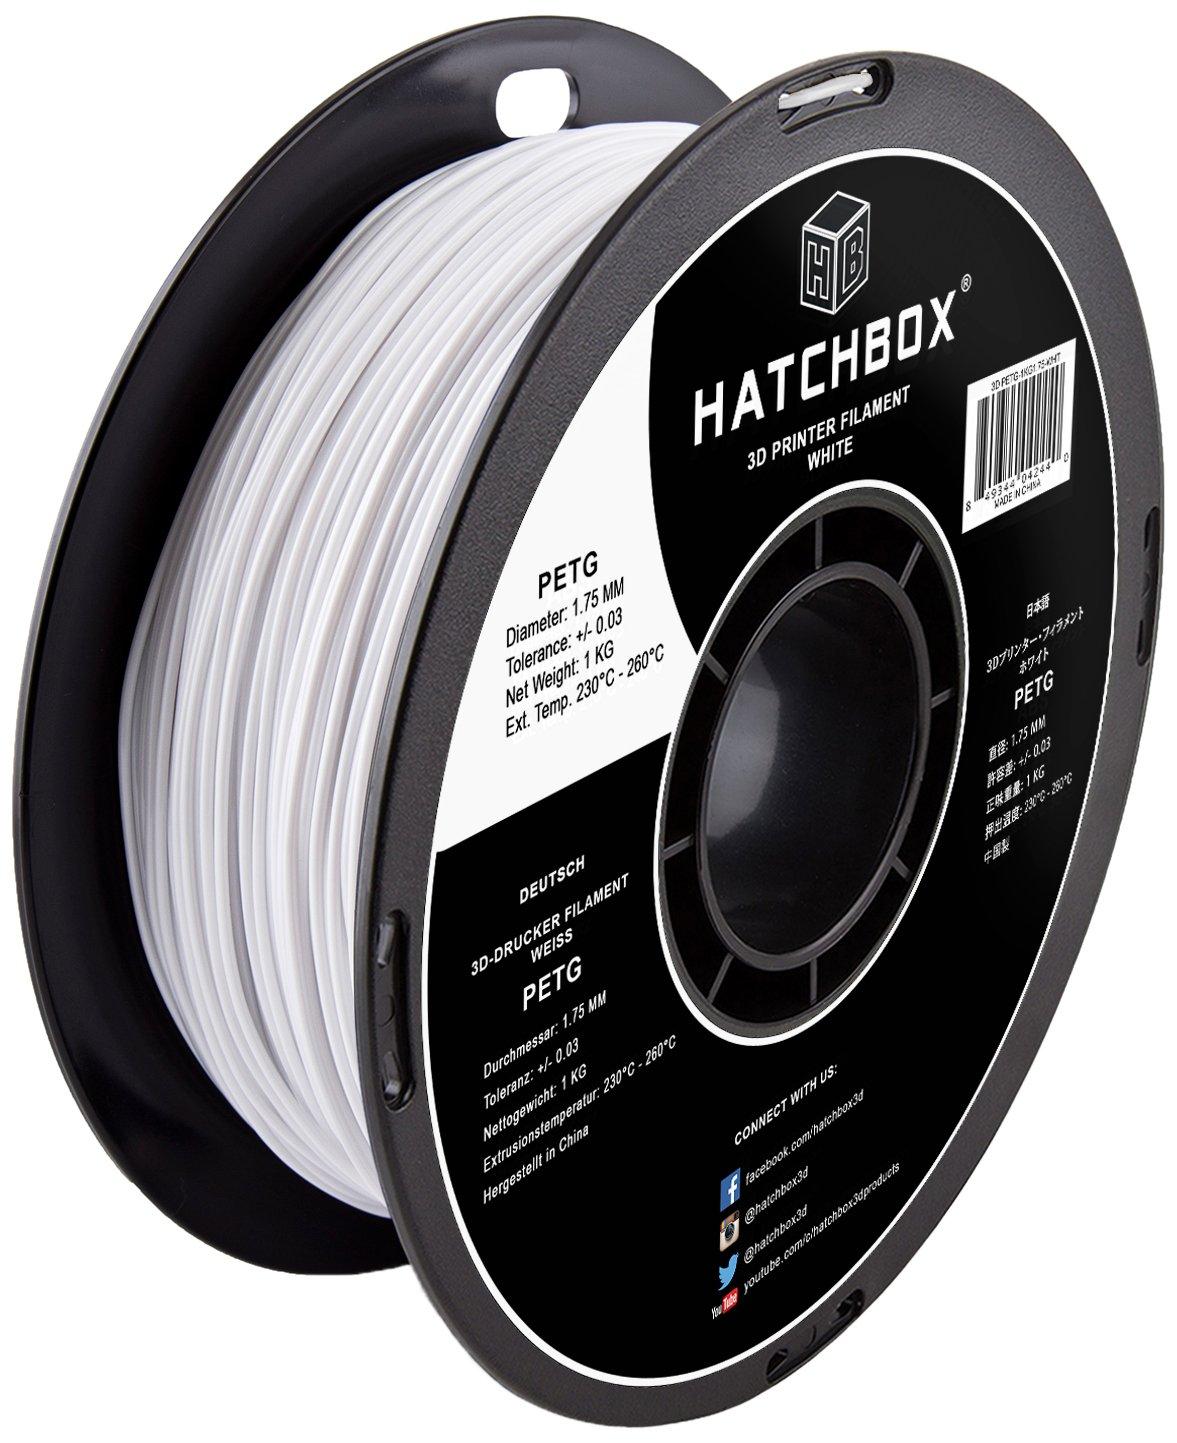 HATCHBOX PETG 3D Printer Filament, Dimensional Accuracy +/- 0.03 mm, 1 kg Spool, 1.75 mm, White